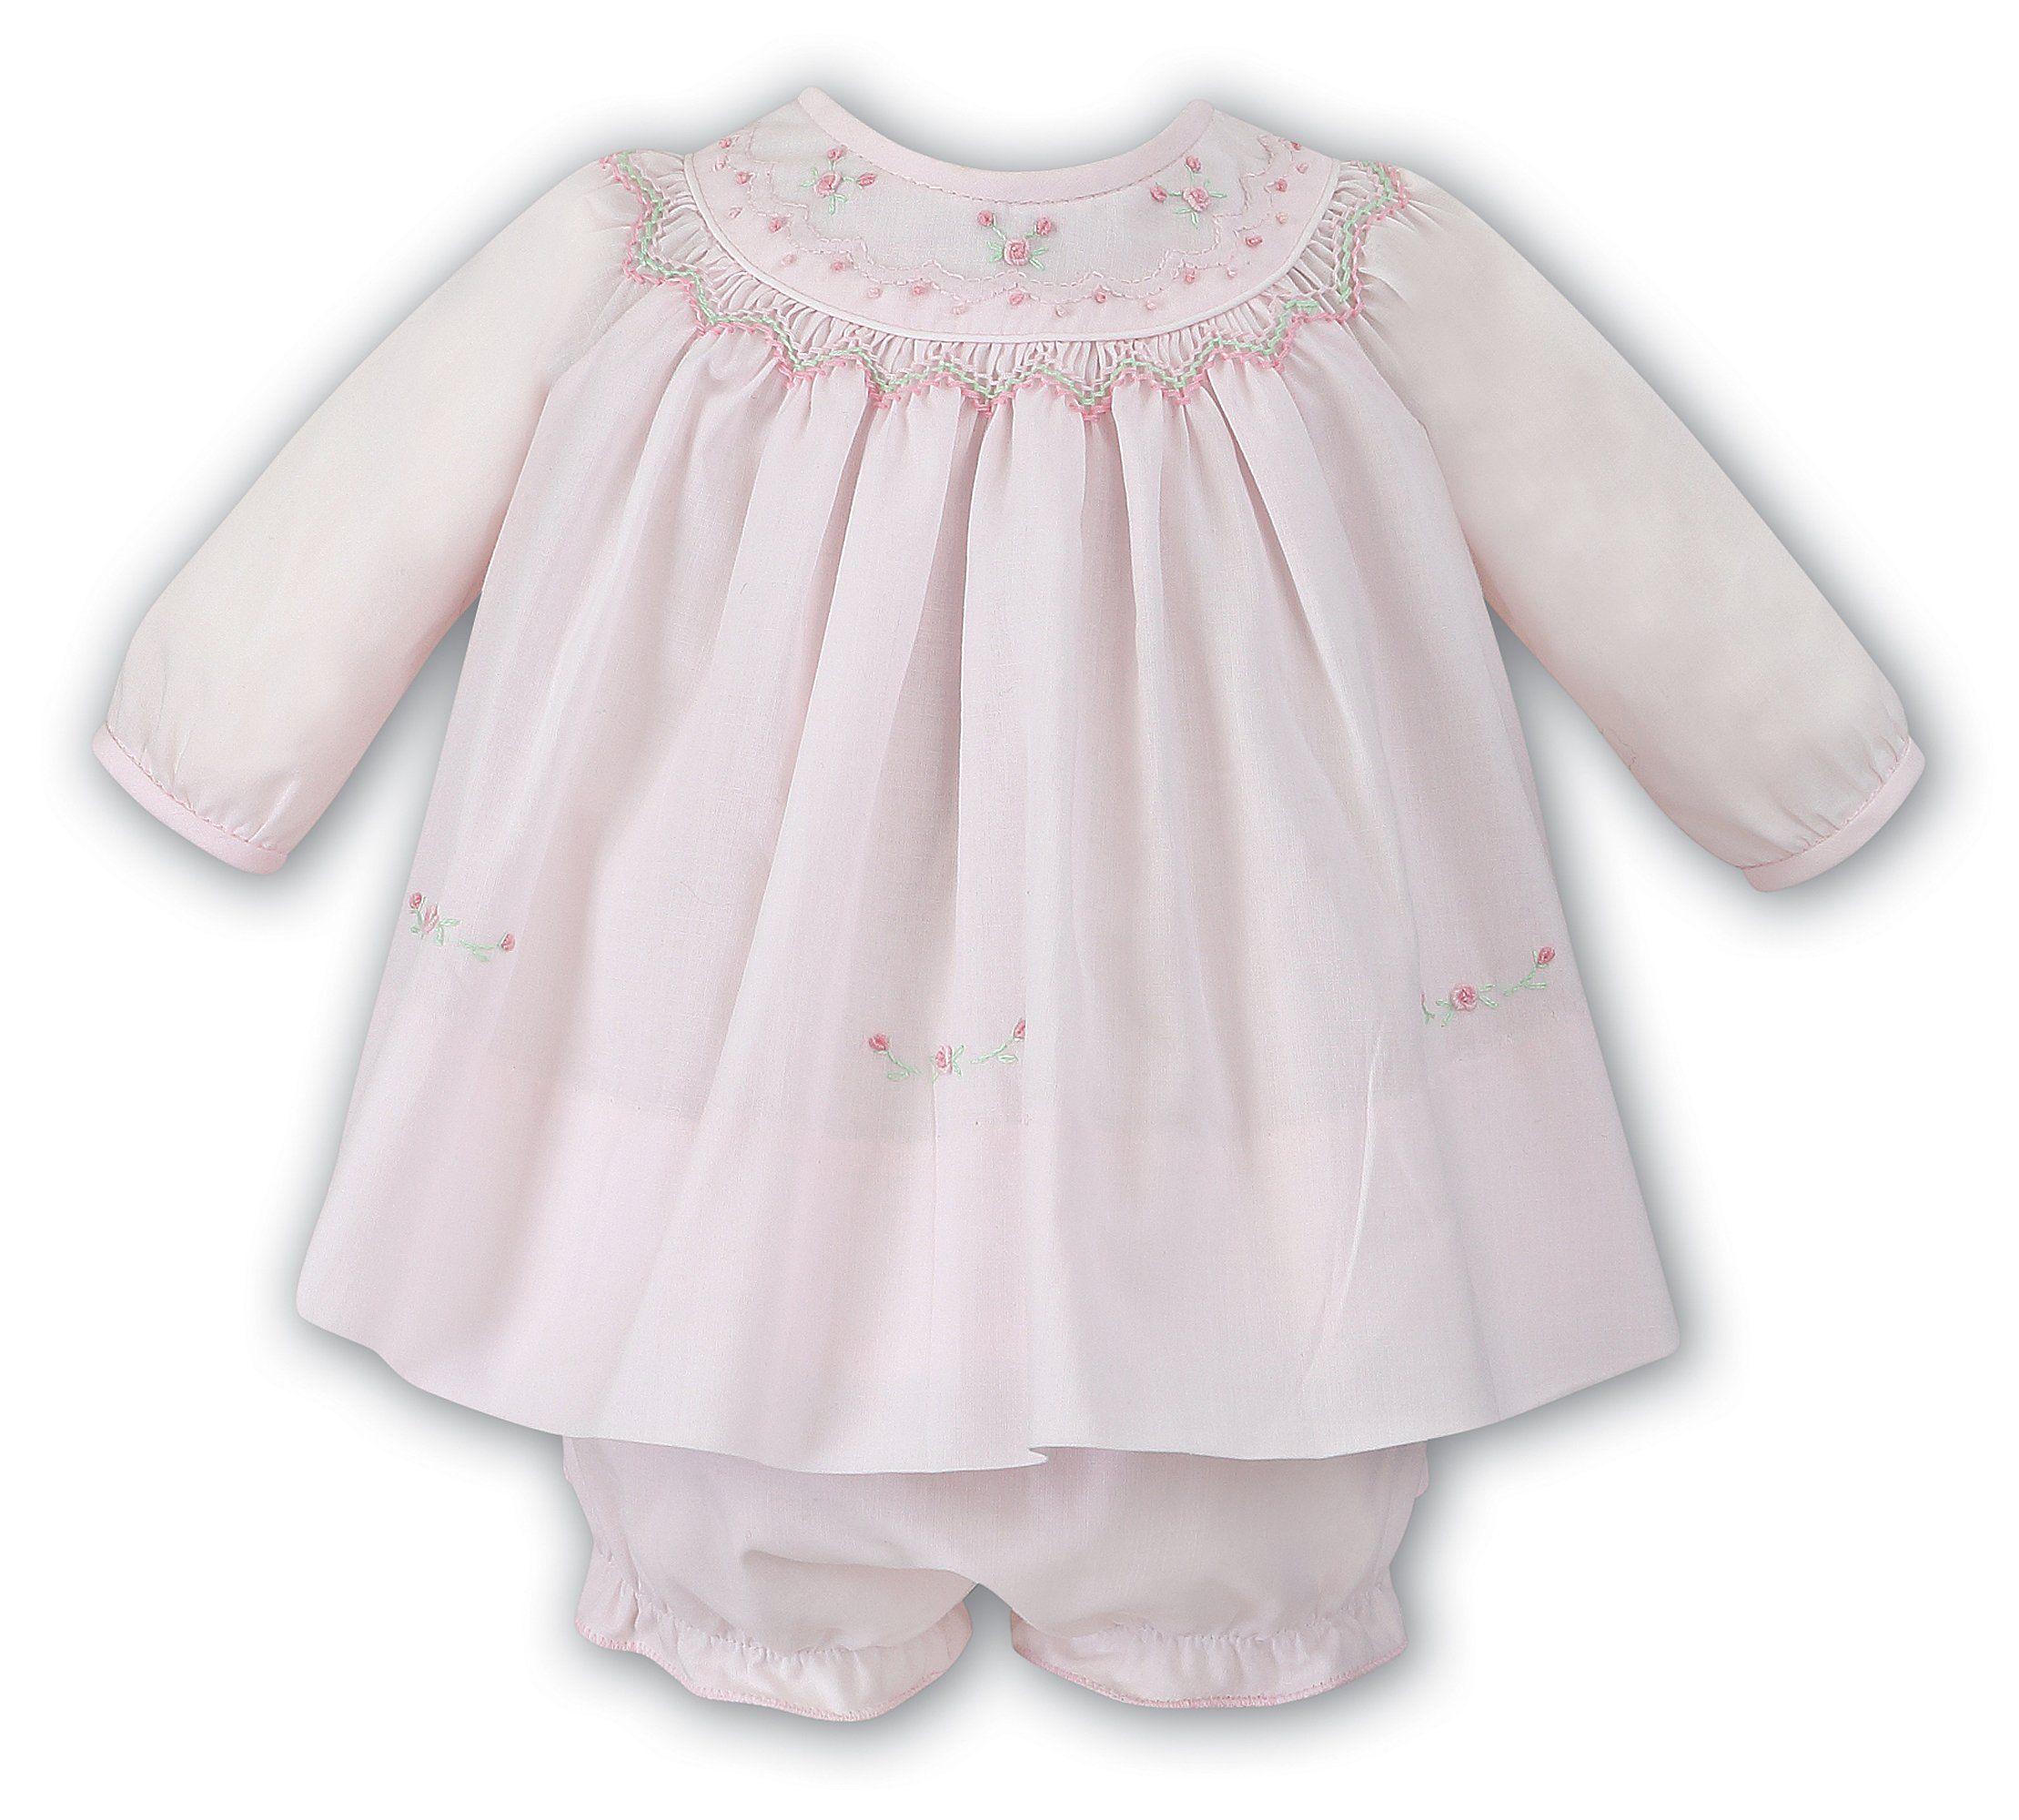 Sarah Louise Baby Girls Pink Rose Smocked Dress Preemie Newborn 3 6 ...